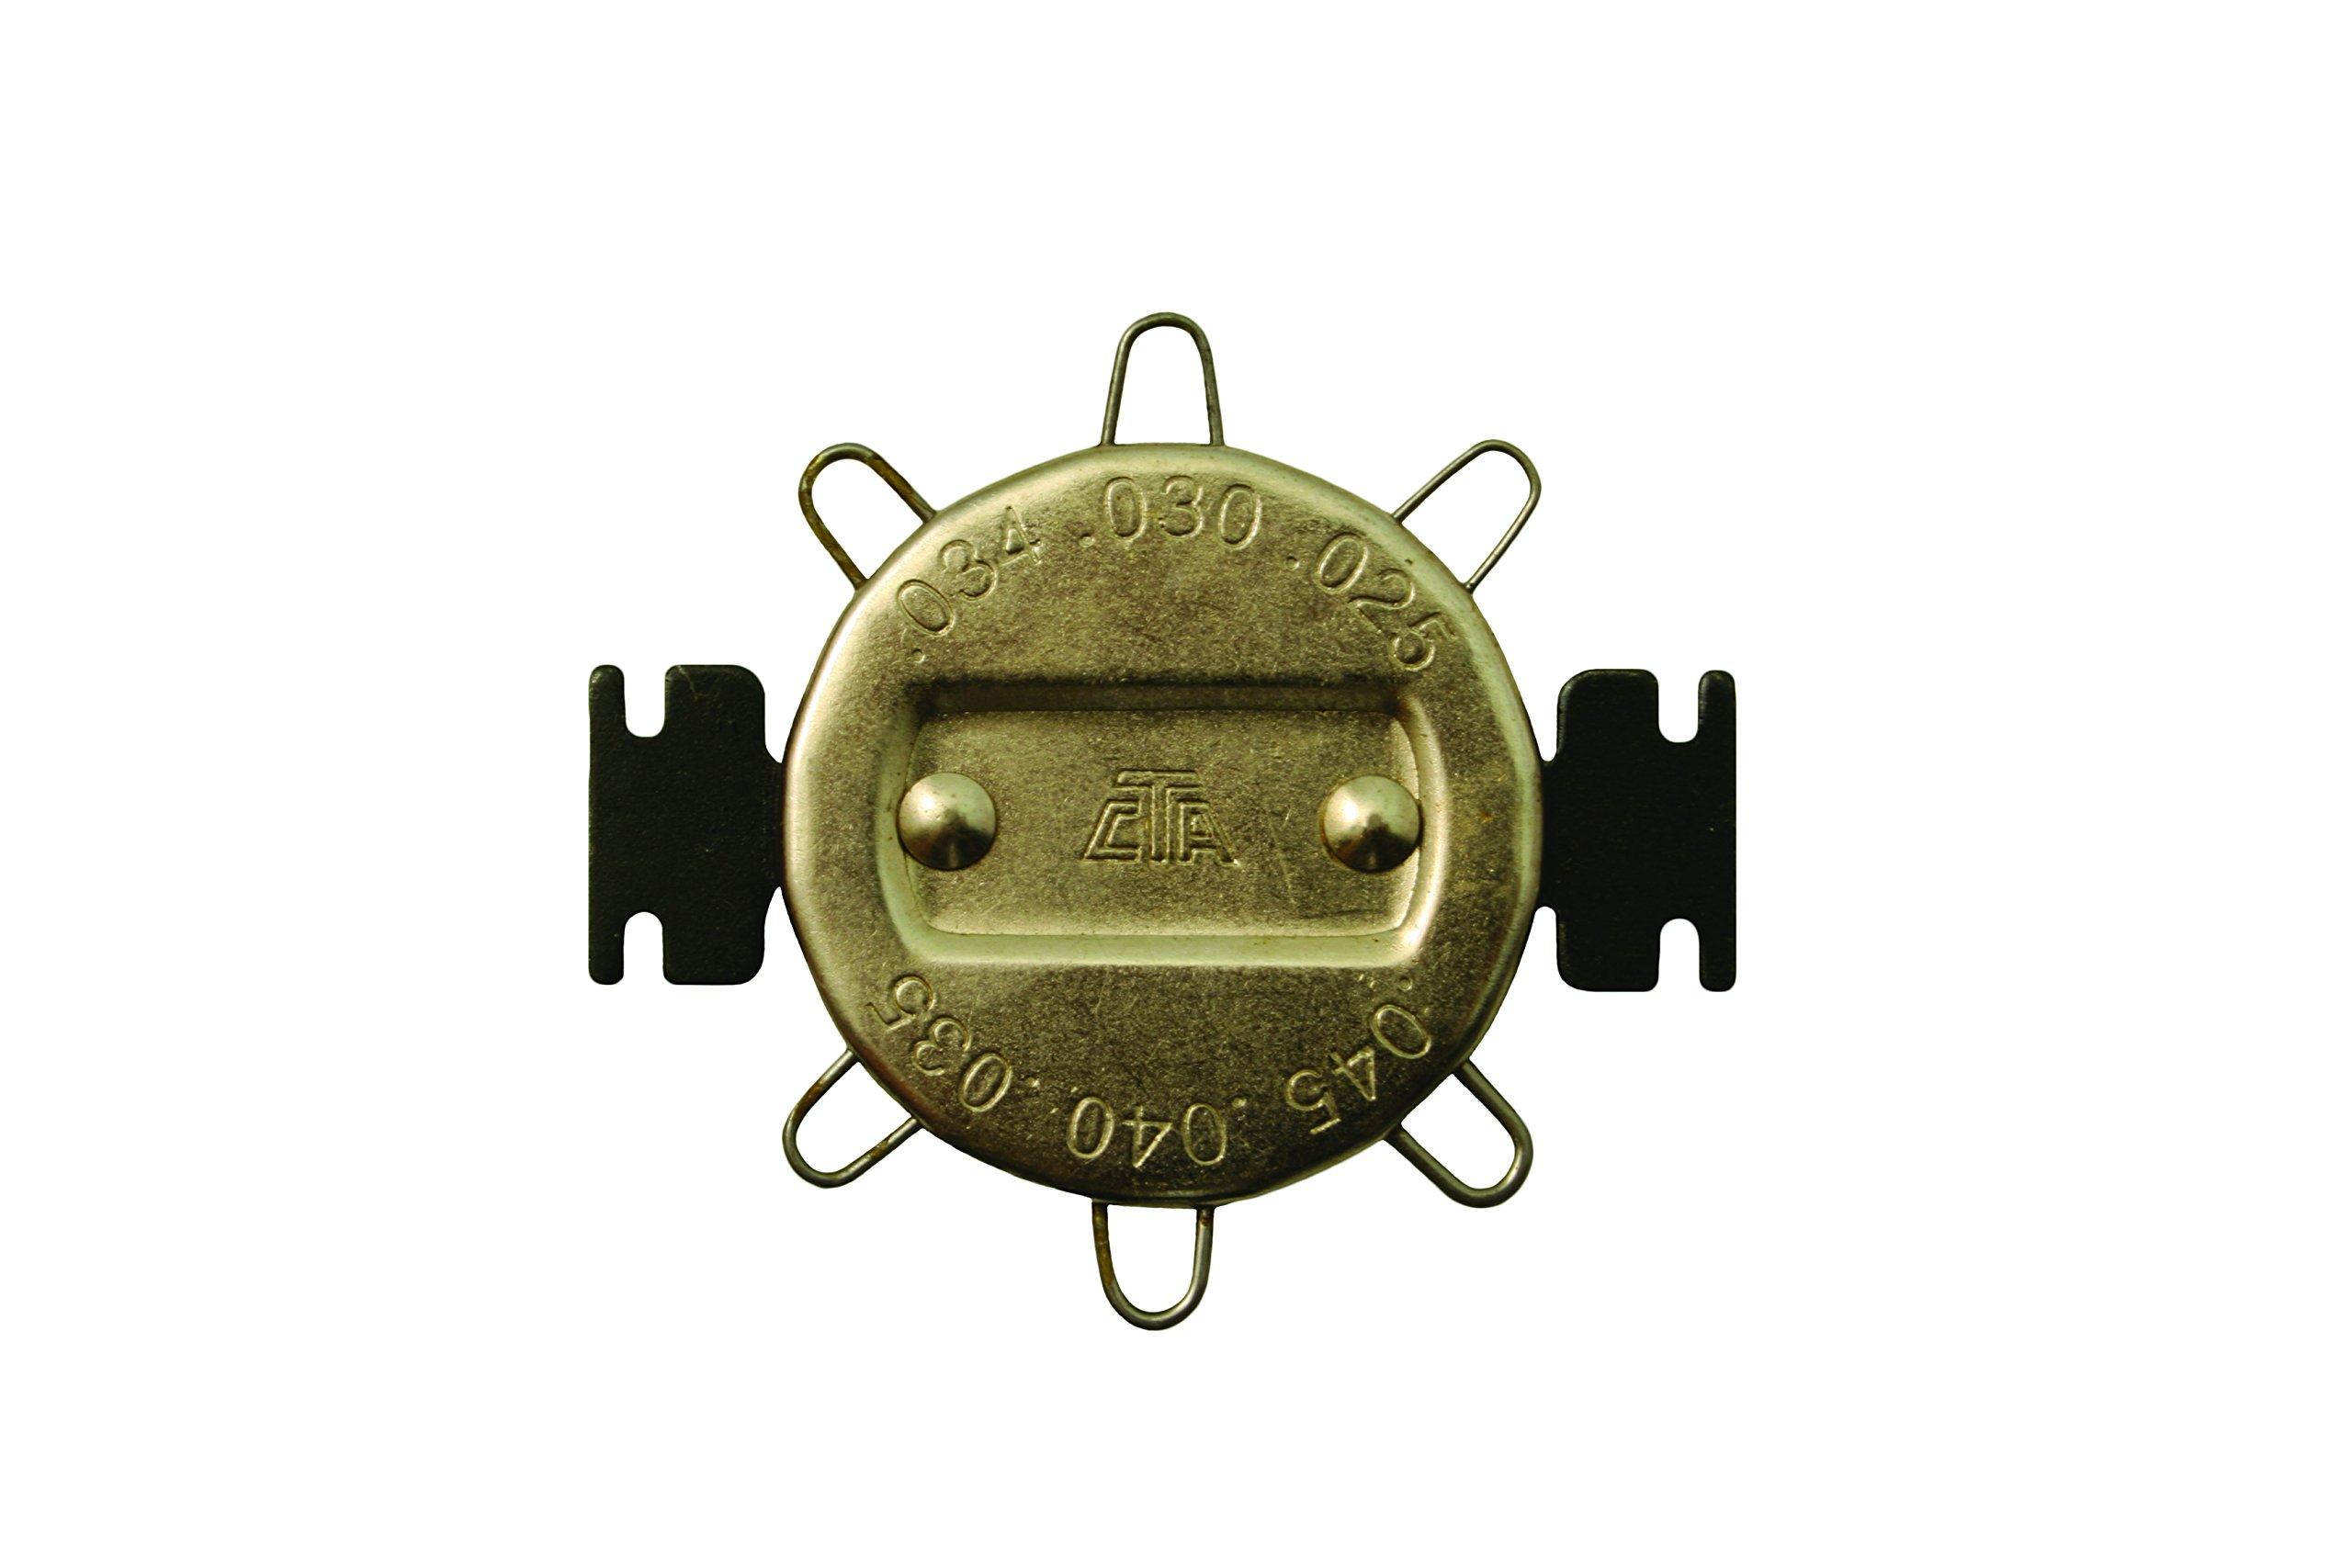 CTA Tools A328 Spark Plug Wire Gauge - 6 Wire HEI